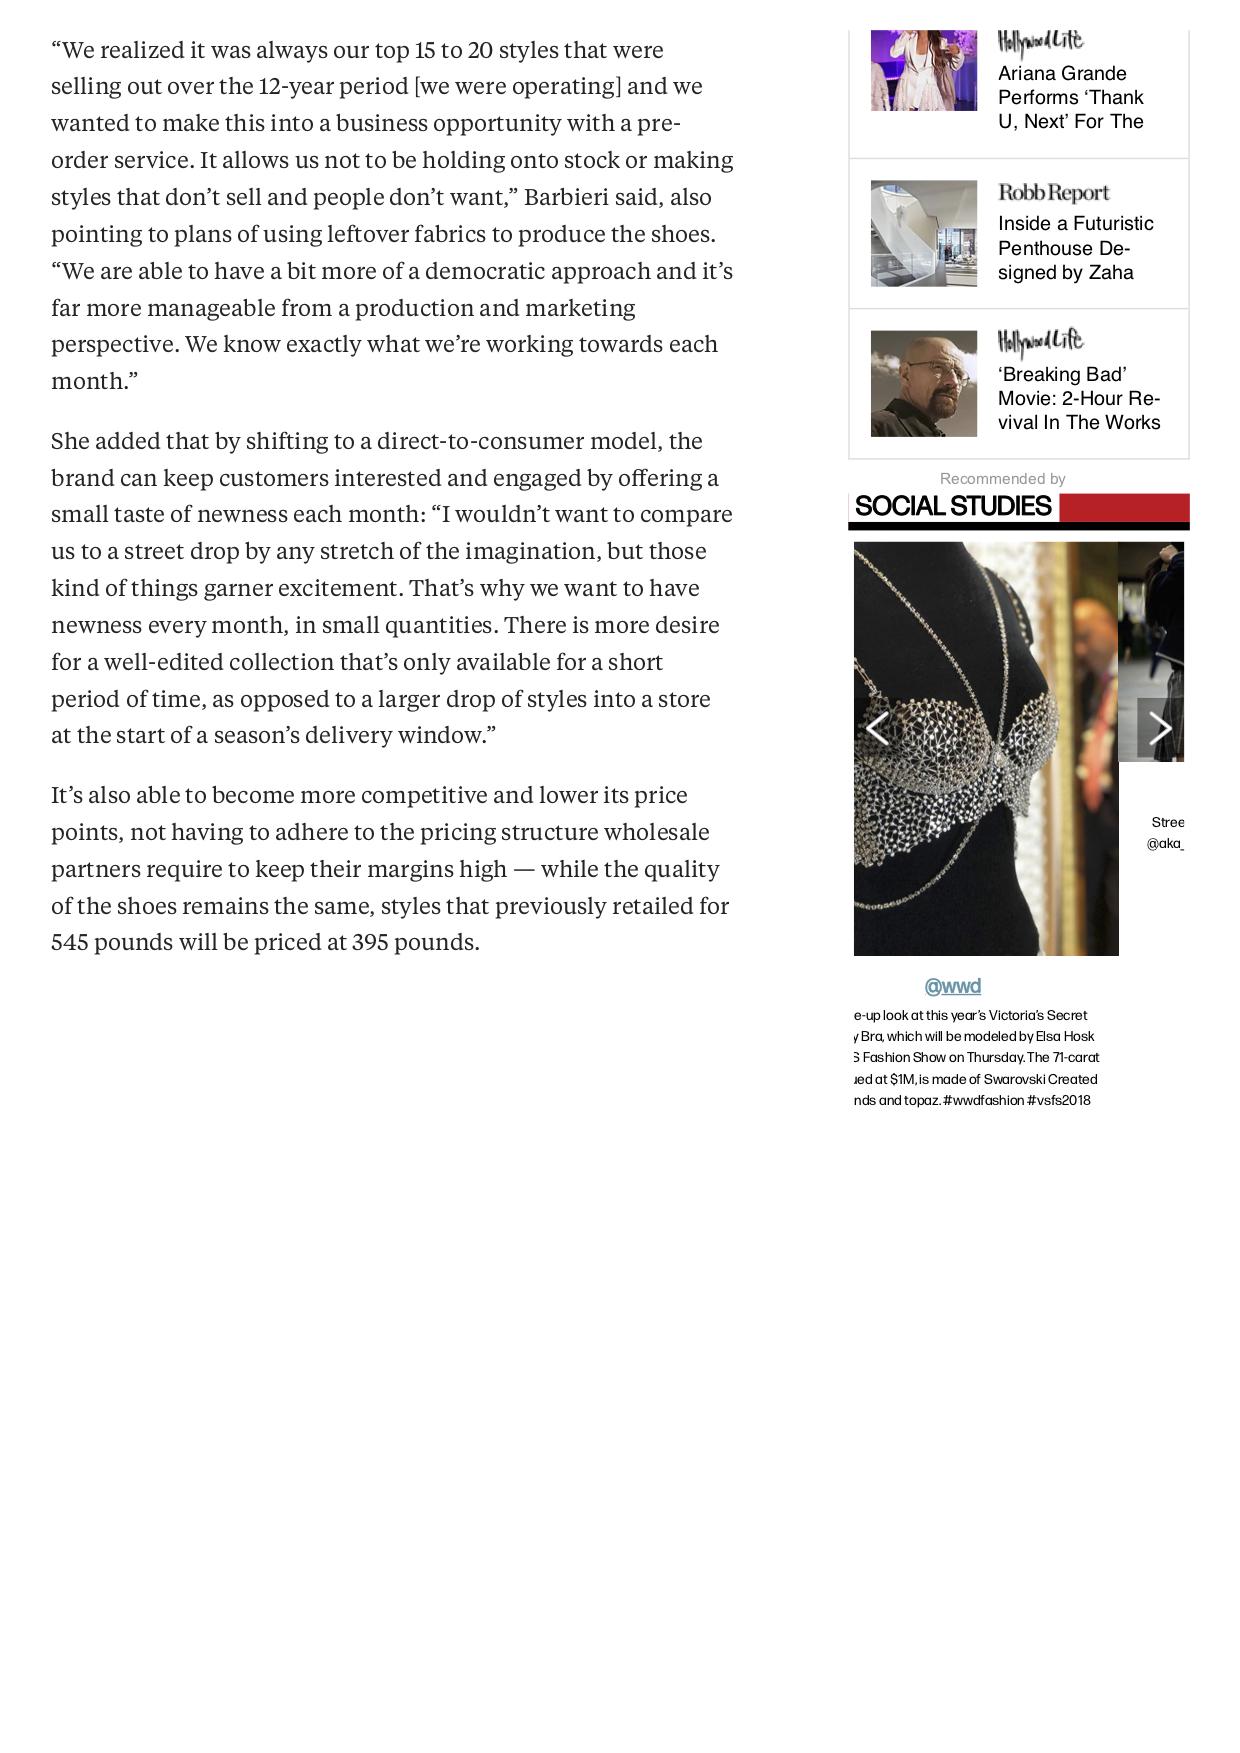 Bionda Castana Returns With Renewed Vision – WWD-3.jpg